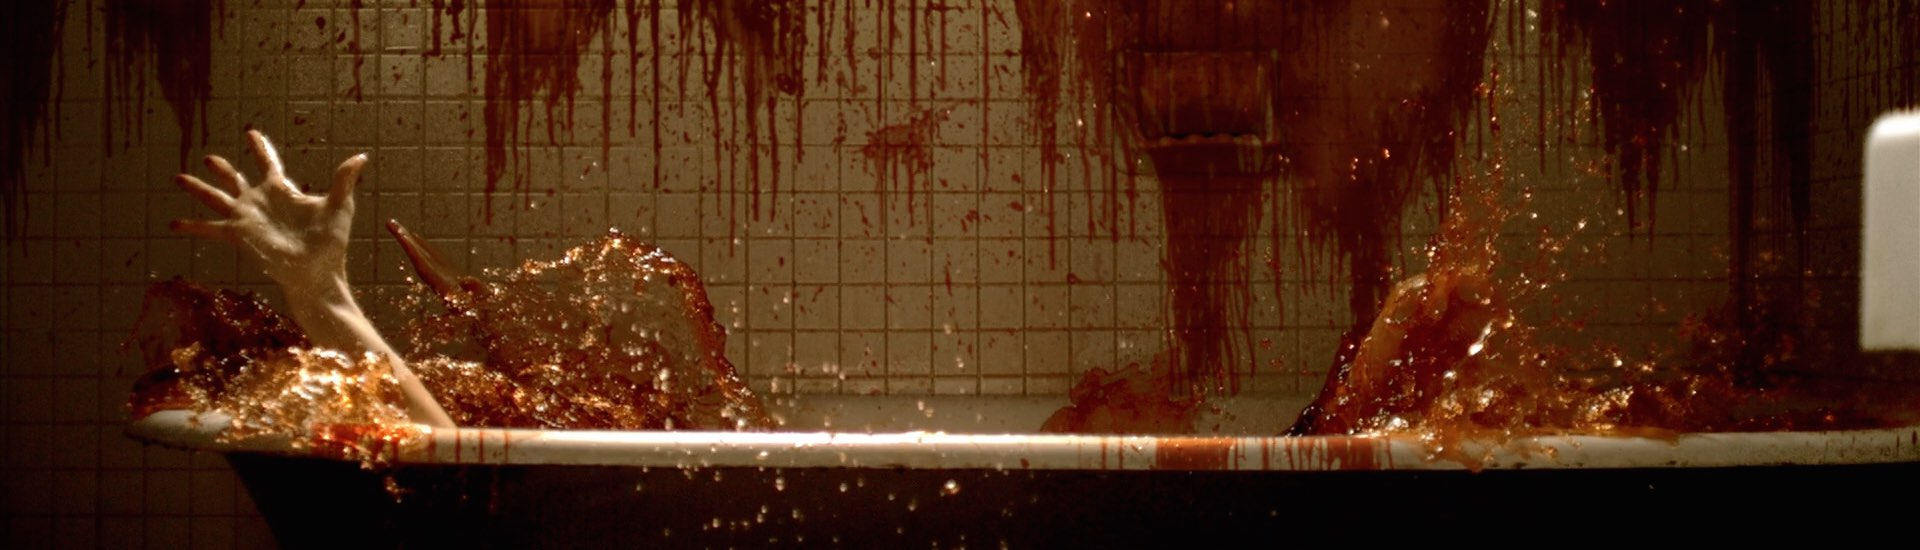 'Demon Inside' (Espectro - 2013) Filmkritik